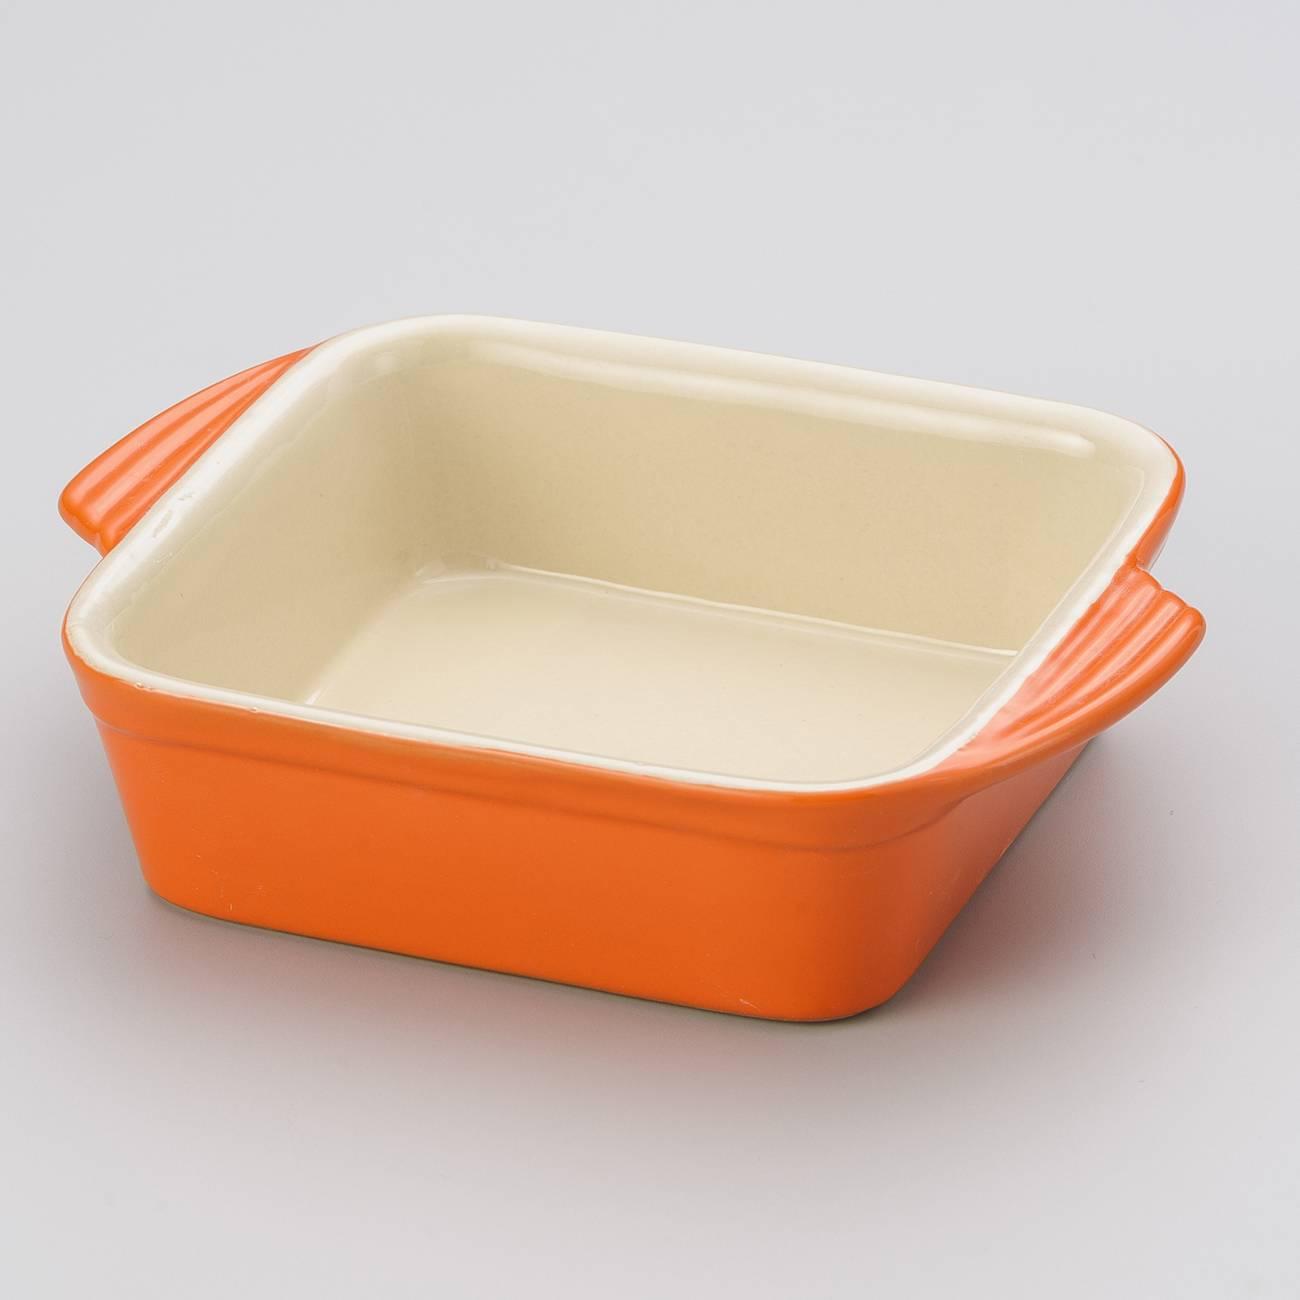 Travessa Quadrada Laranja em Cerâmica - Bon Gourmet - 18x14,5 cm